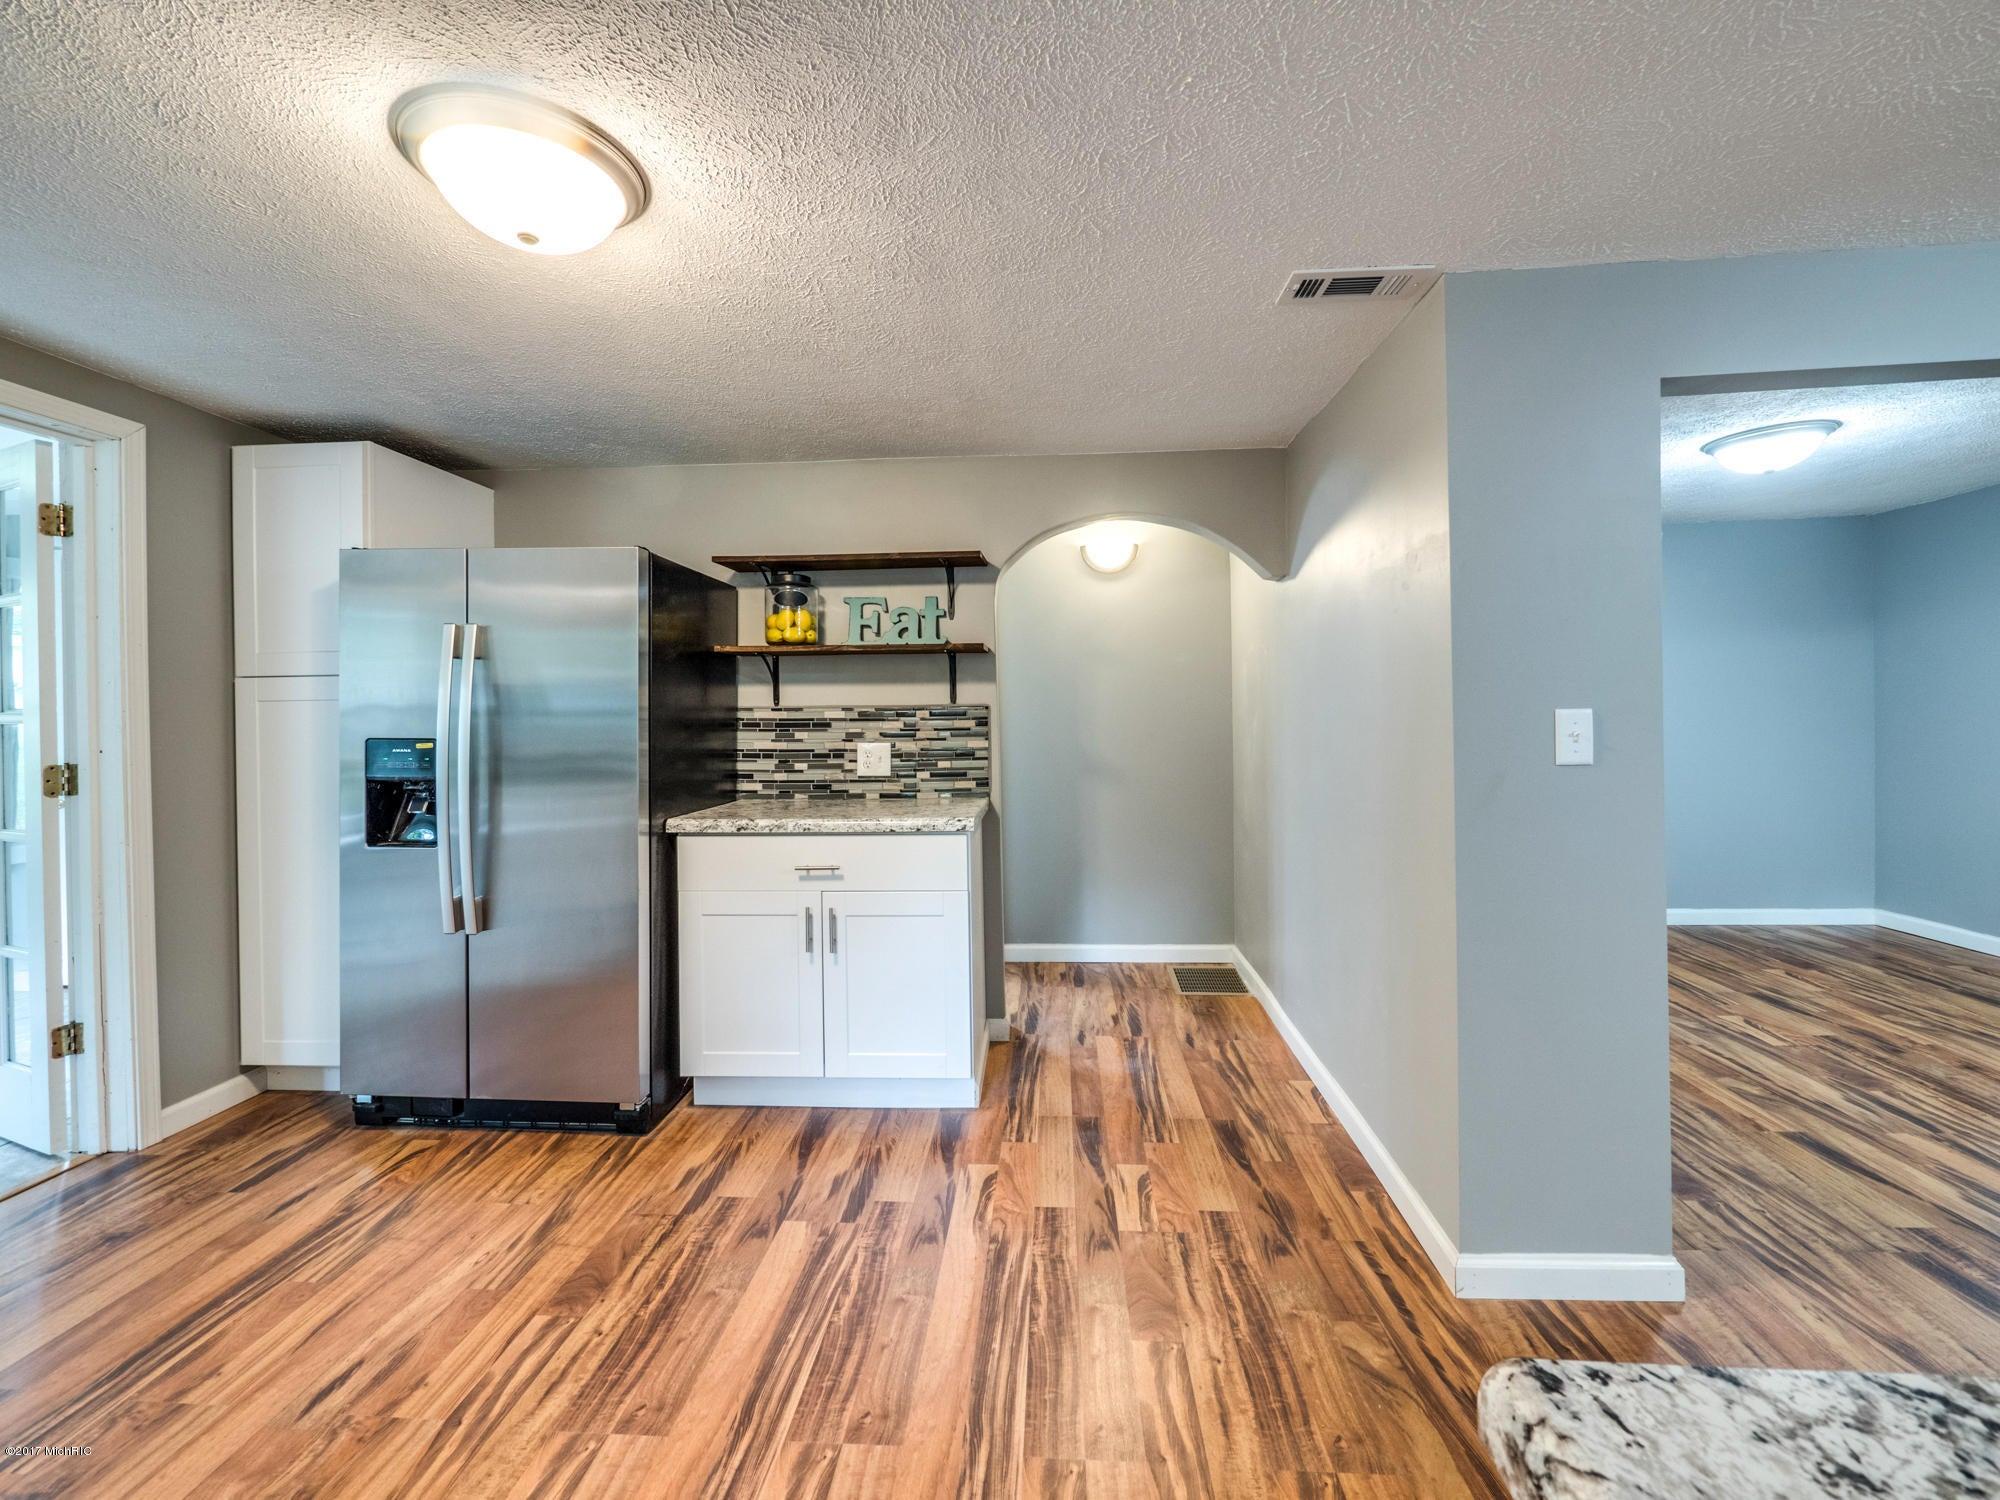 460 W 4th Avenue Drive Broomfield, CO 80020 - MLS #: 8337465